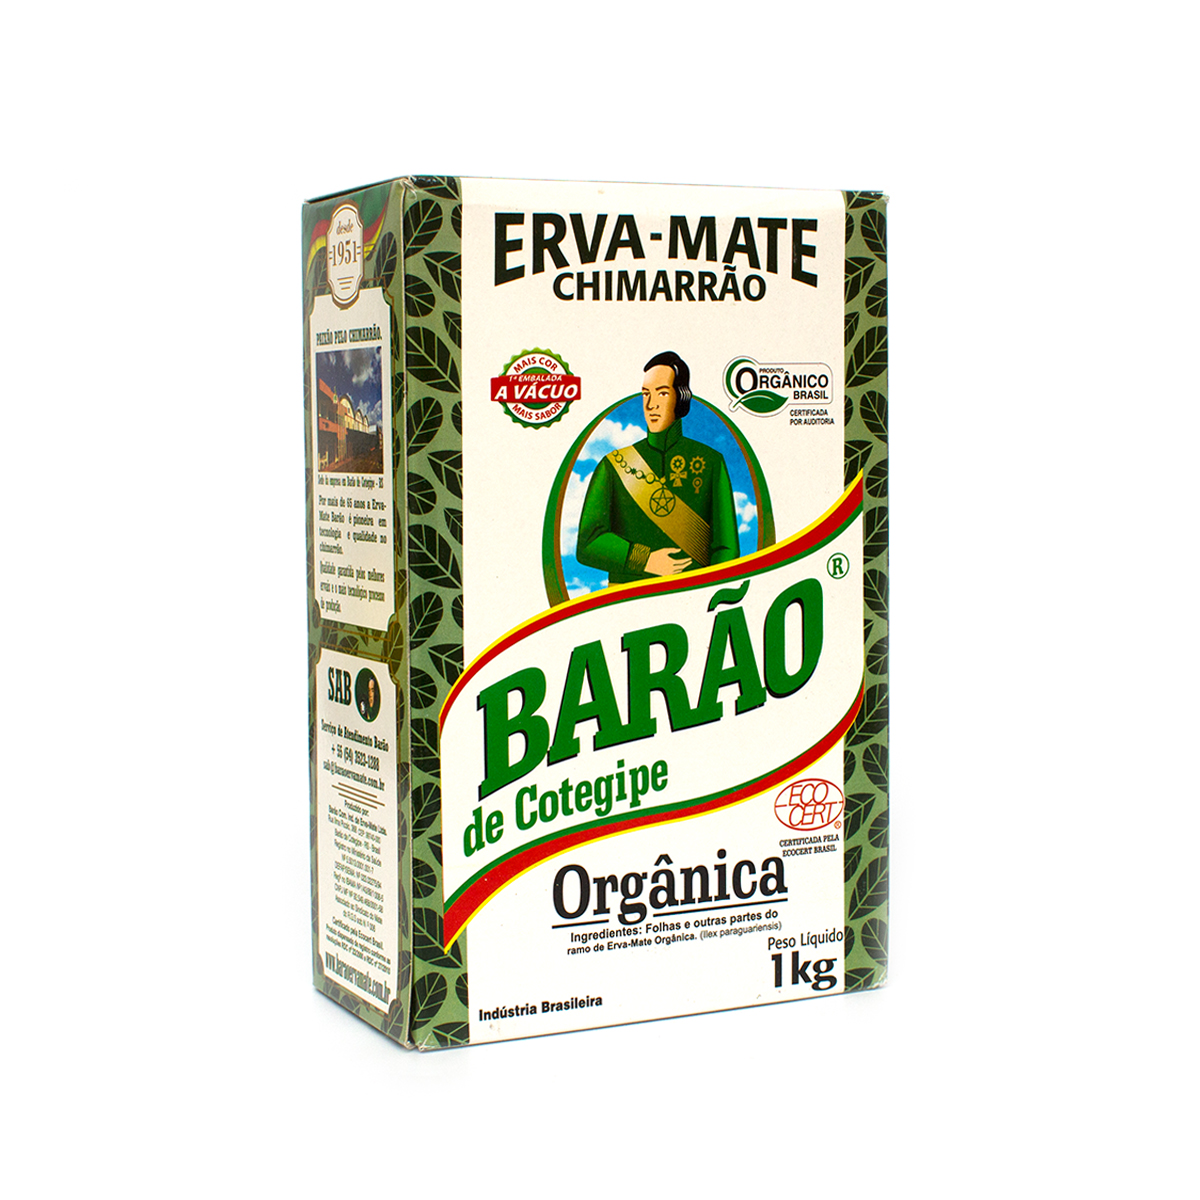 Мате Barao De Cotegipe Organica, 1000 г мате pipore especial 1000 г